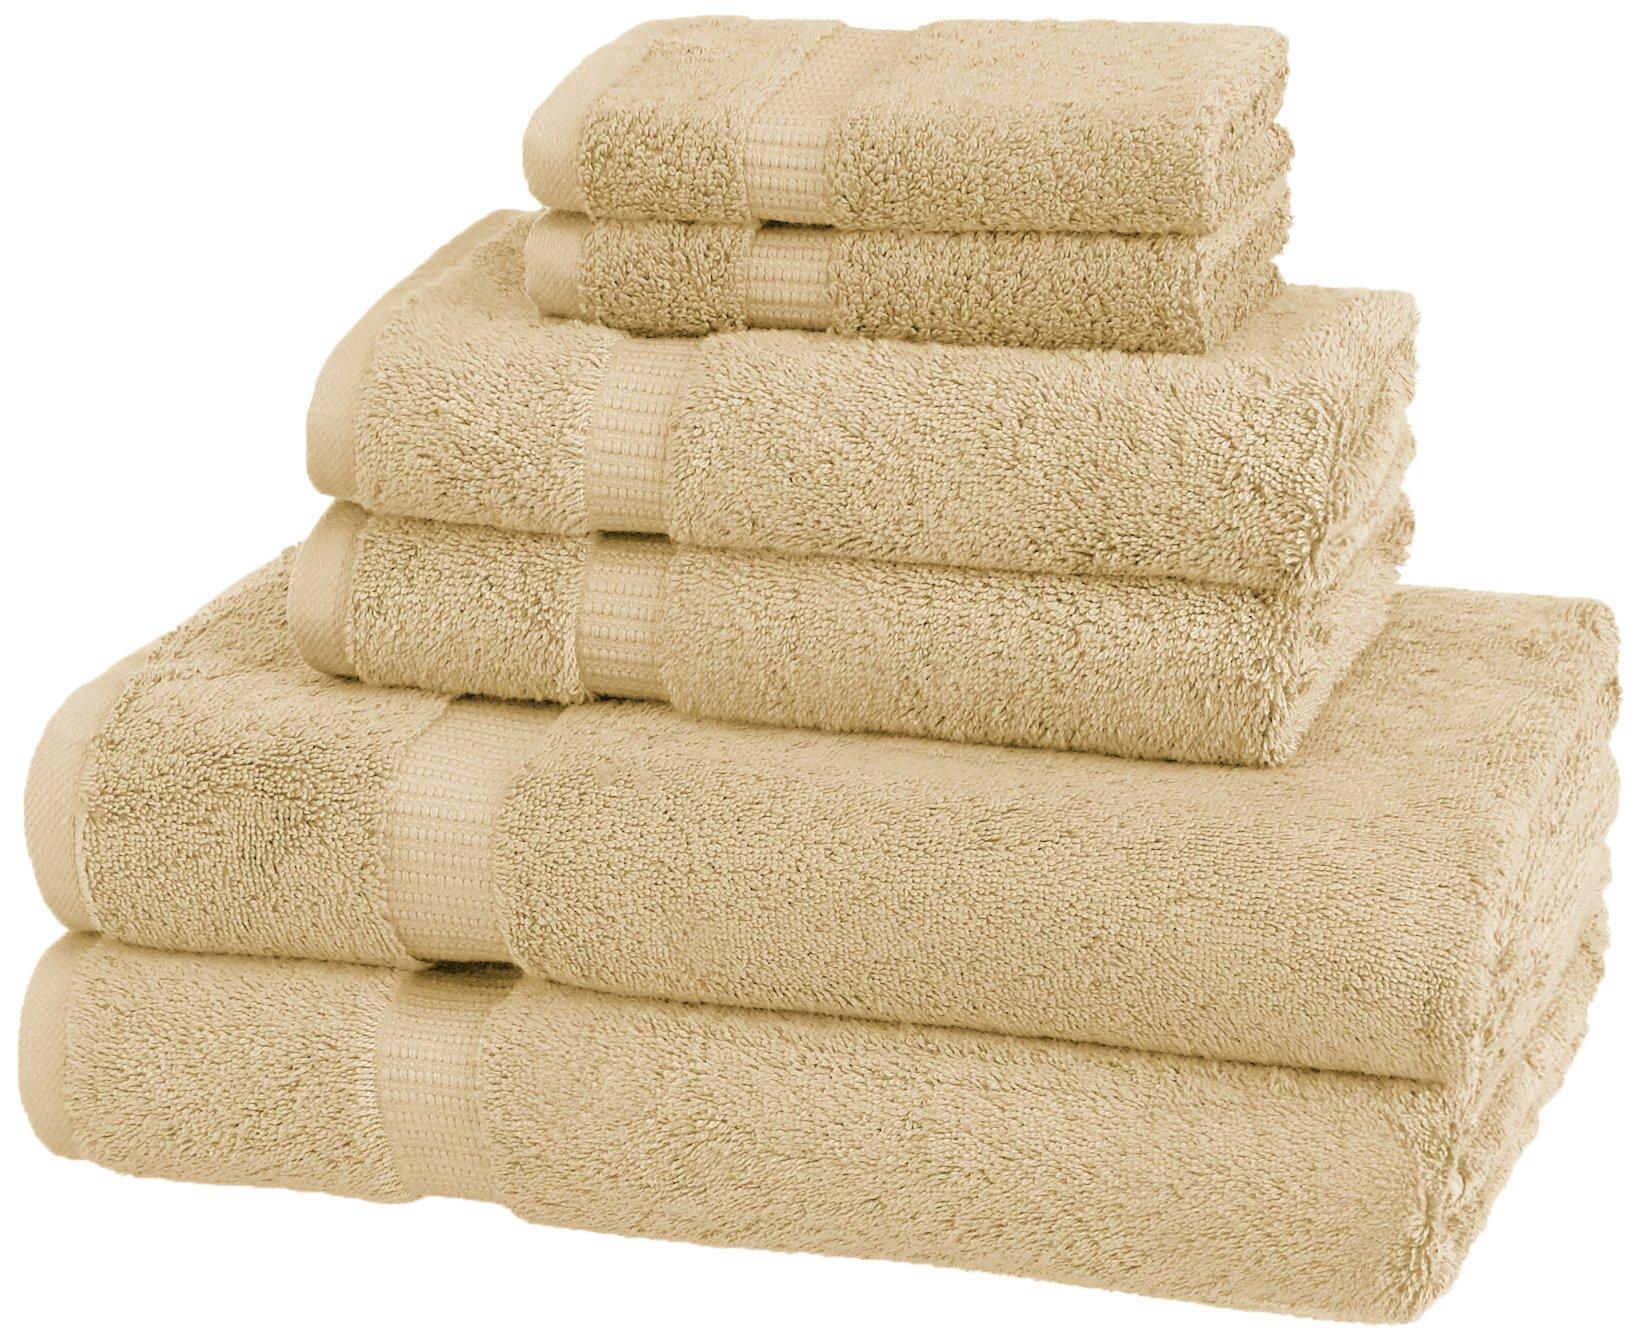 Pinzon Organic Cotton Bathroom Towels, 6 Piece Set, Sand